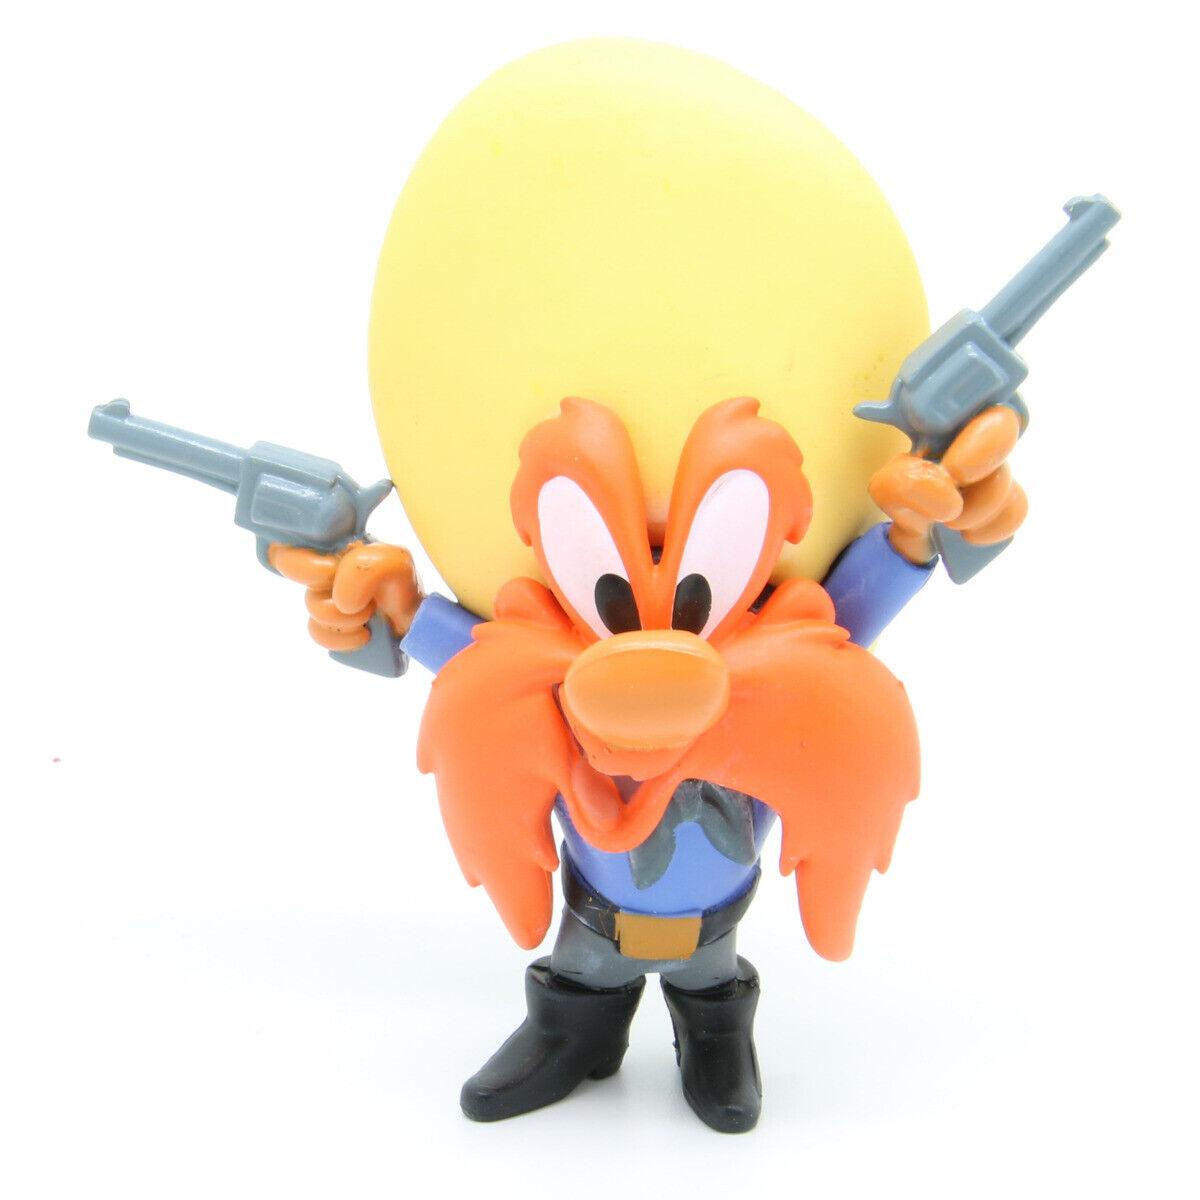 Funko Mystery Minis Saturday Morning Cartoons Warner Bros - Yosemite Sam Toys...